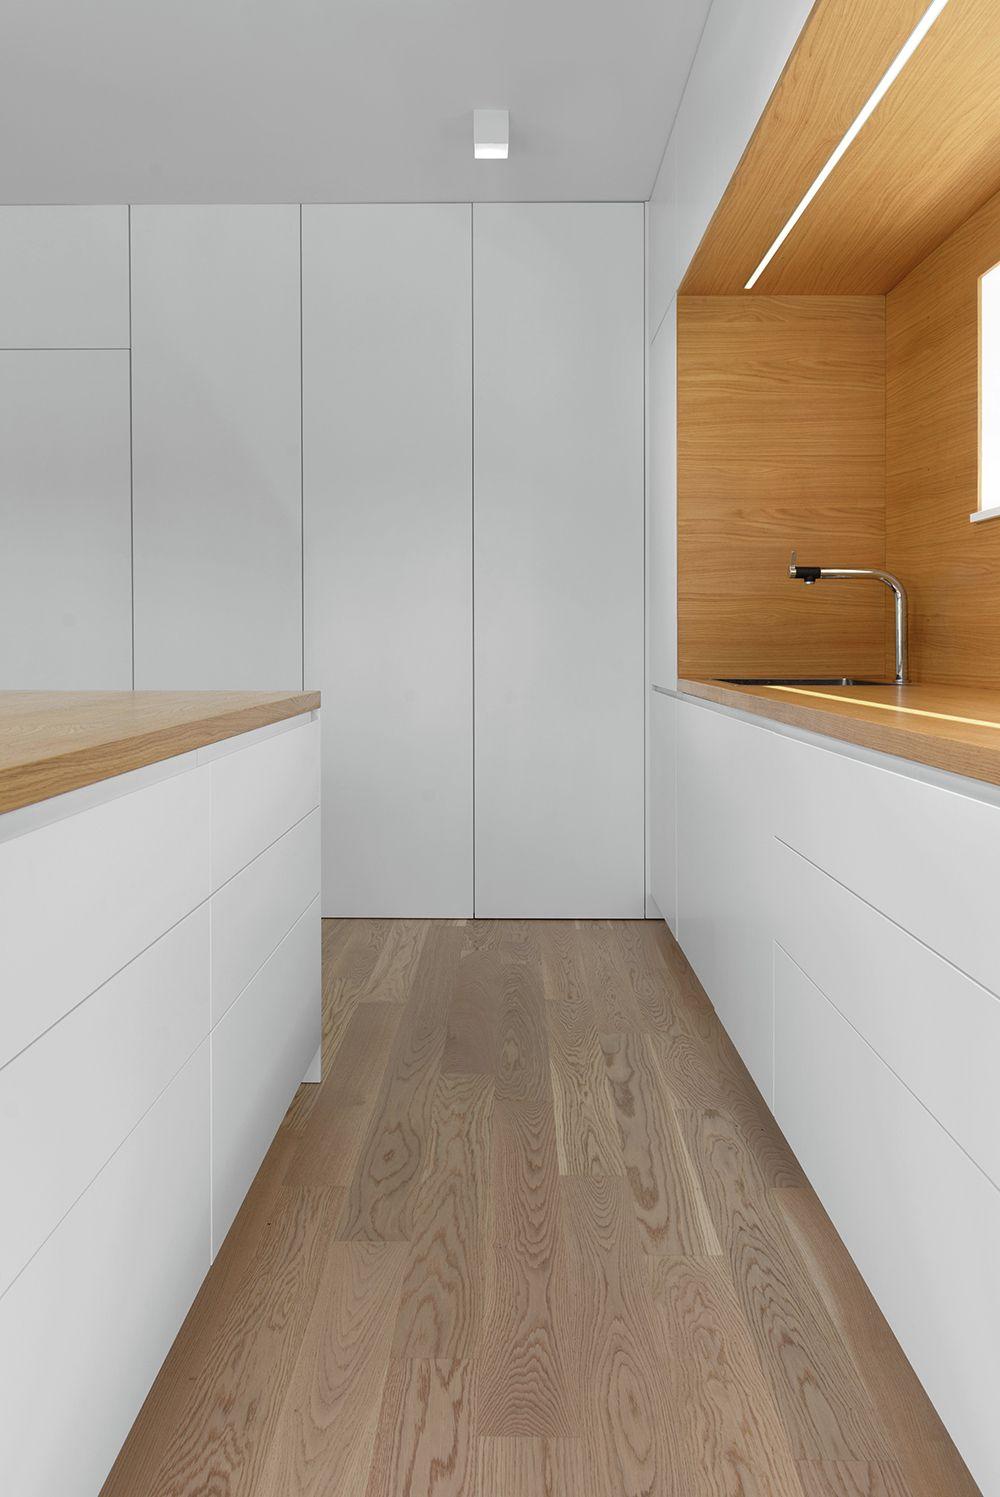 Gallery of Folding Wall Apartment / Arhitektura d.o.o.  – 7